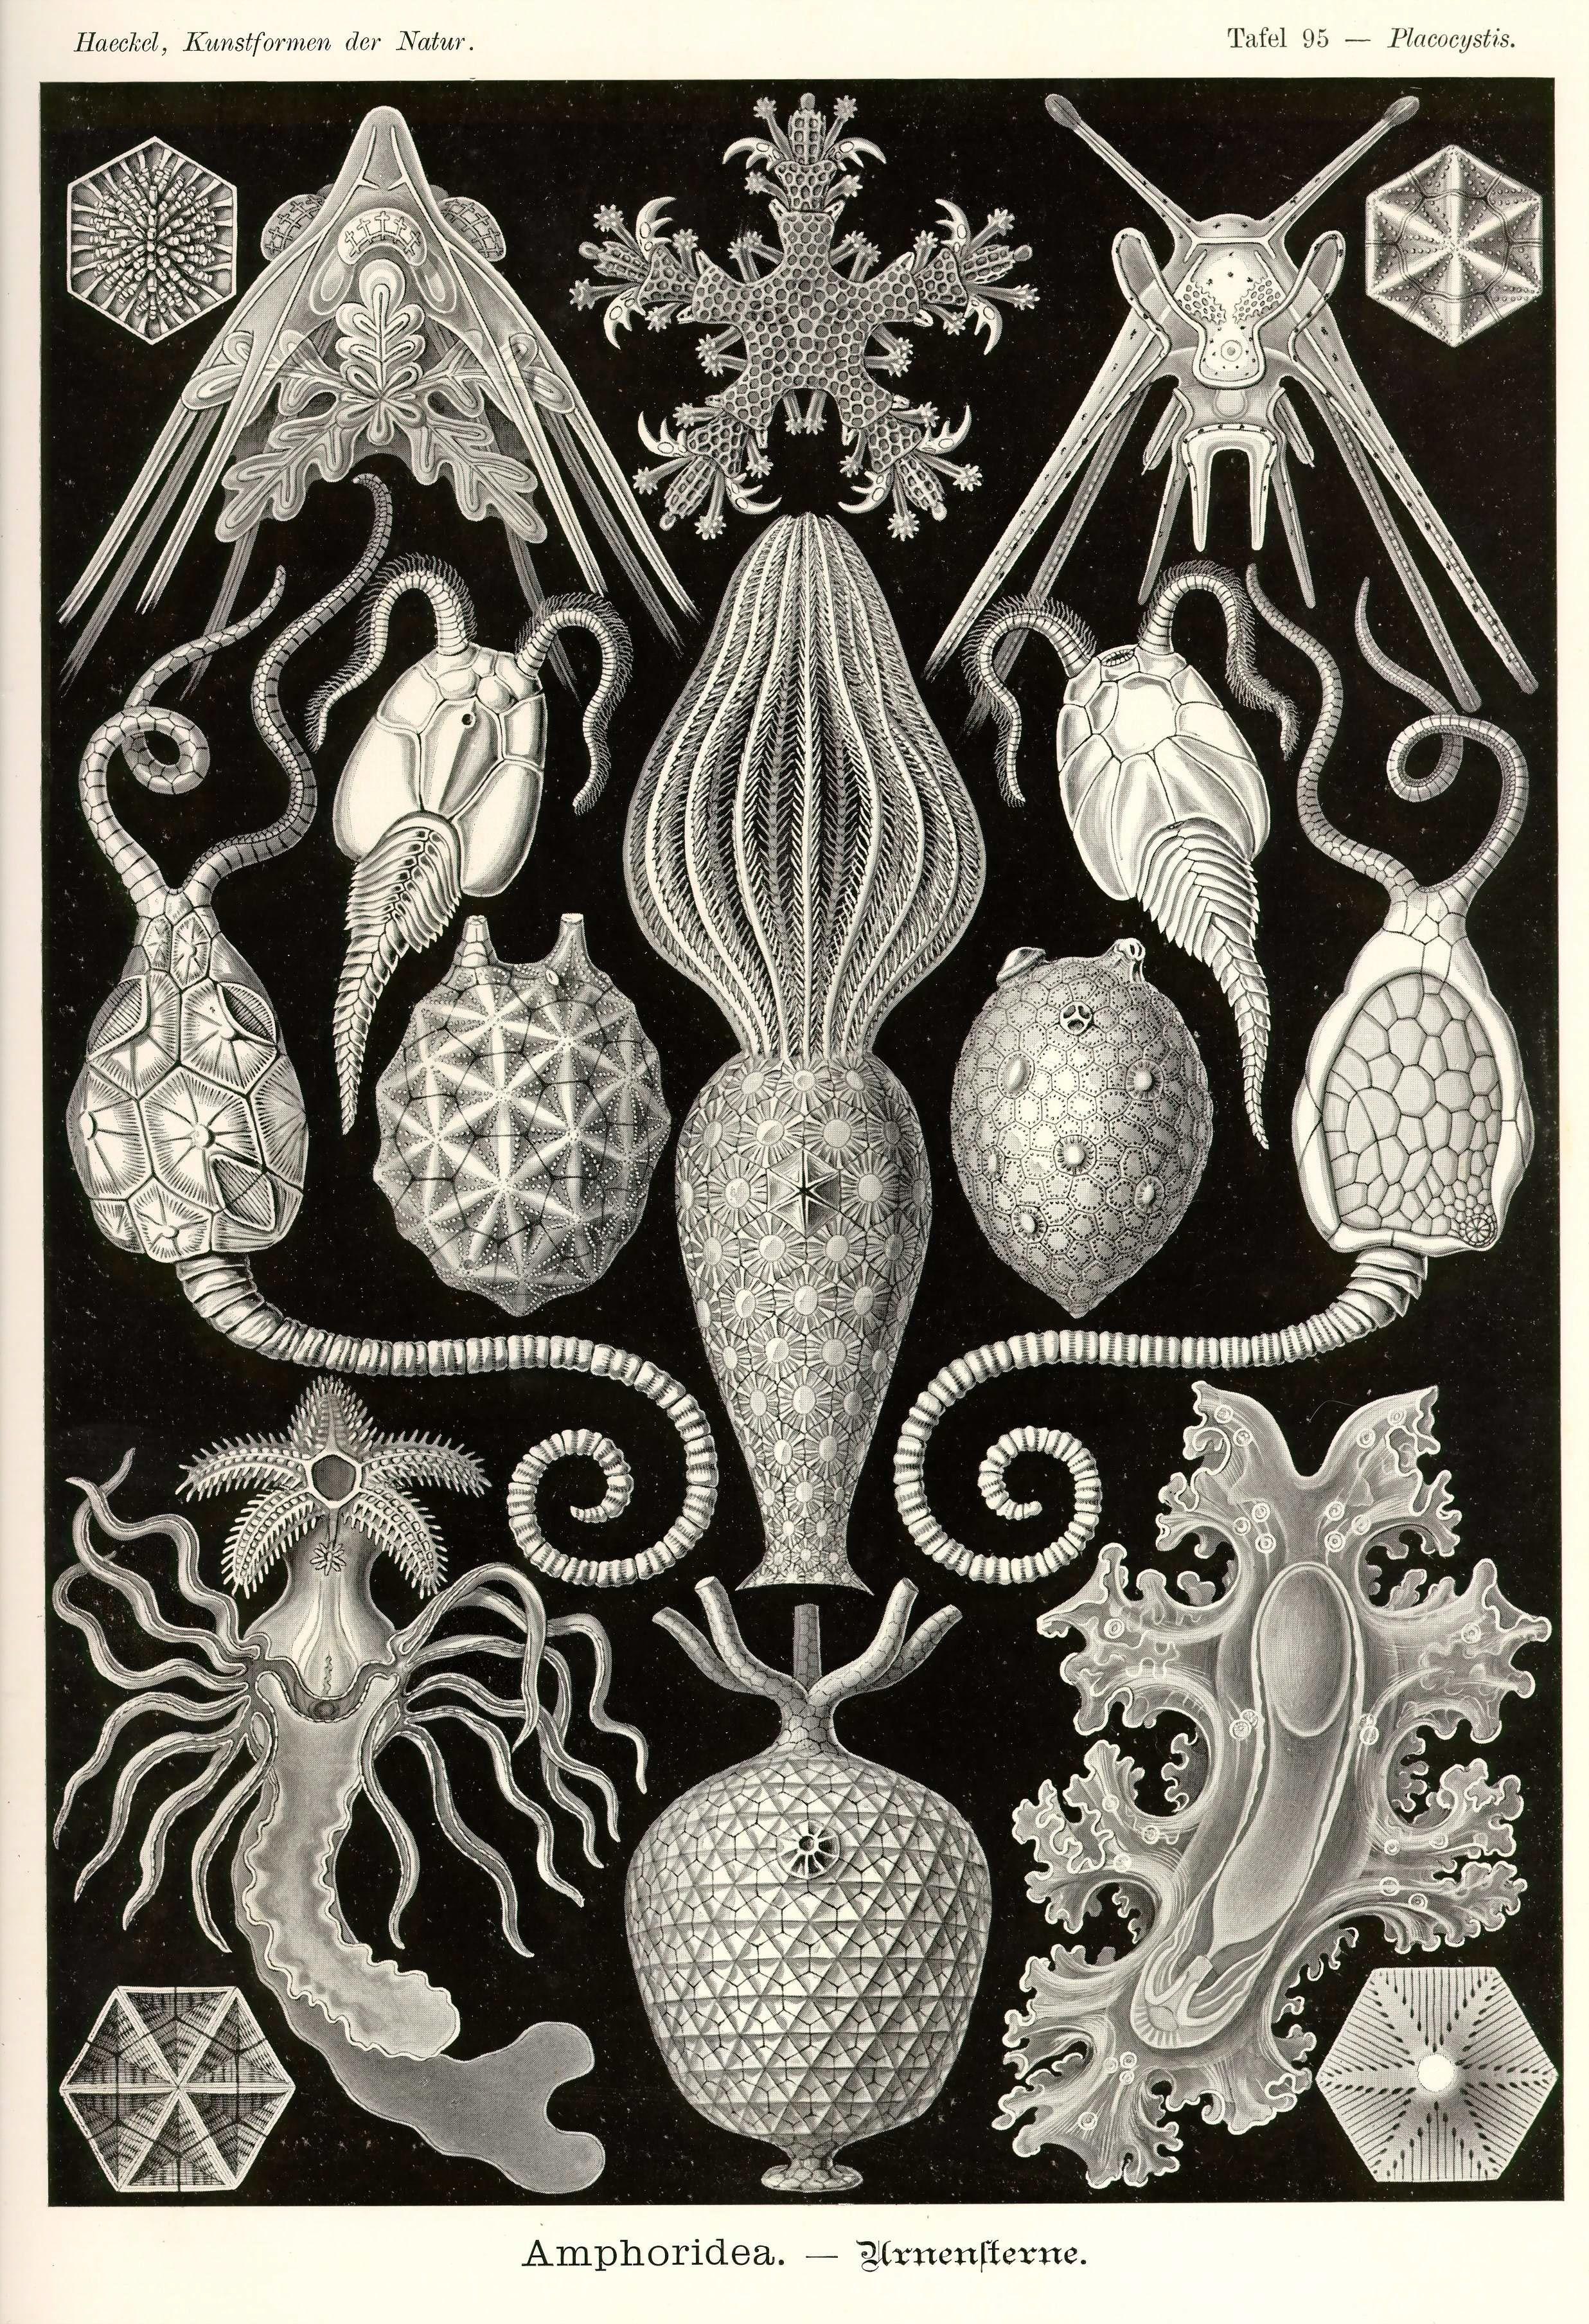 Kunstformen der Natur Tafel 95 - Placocystis